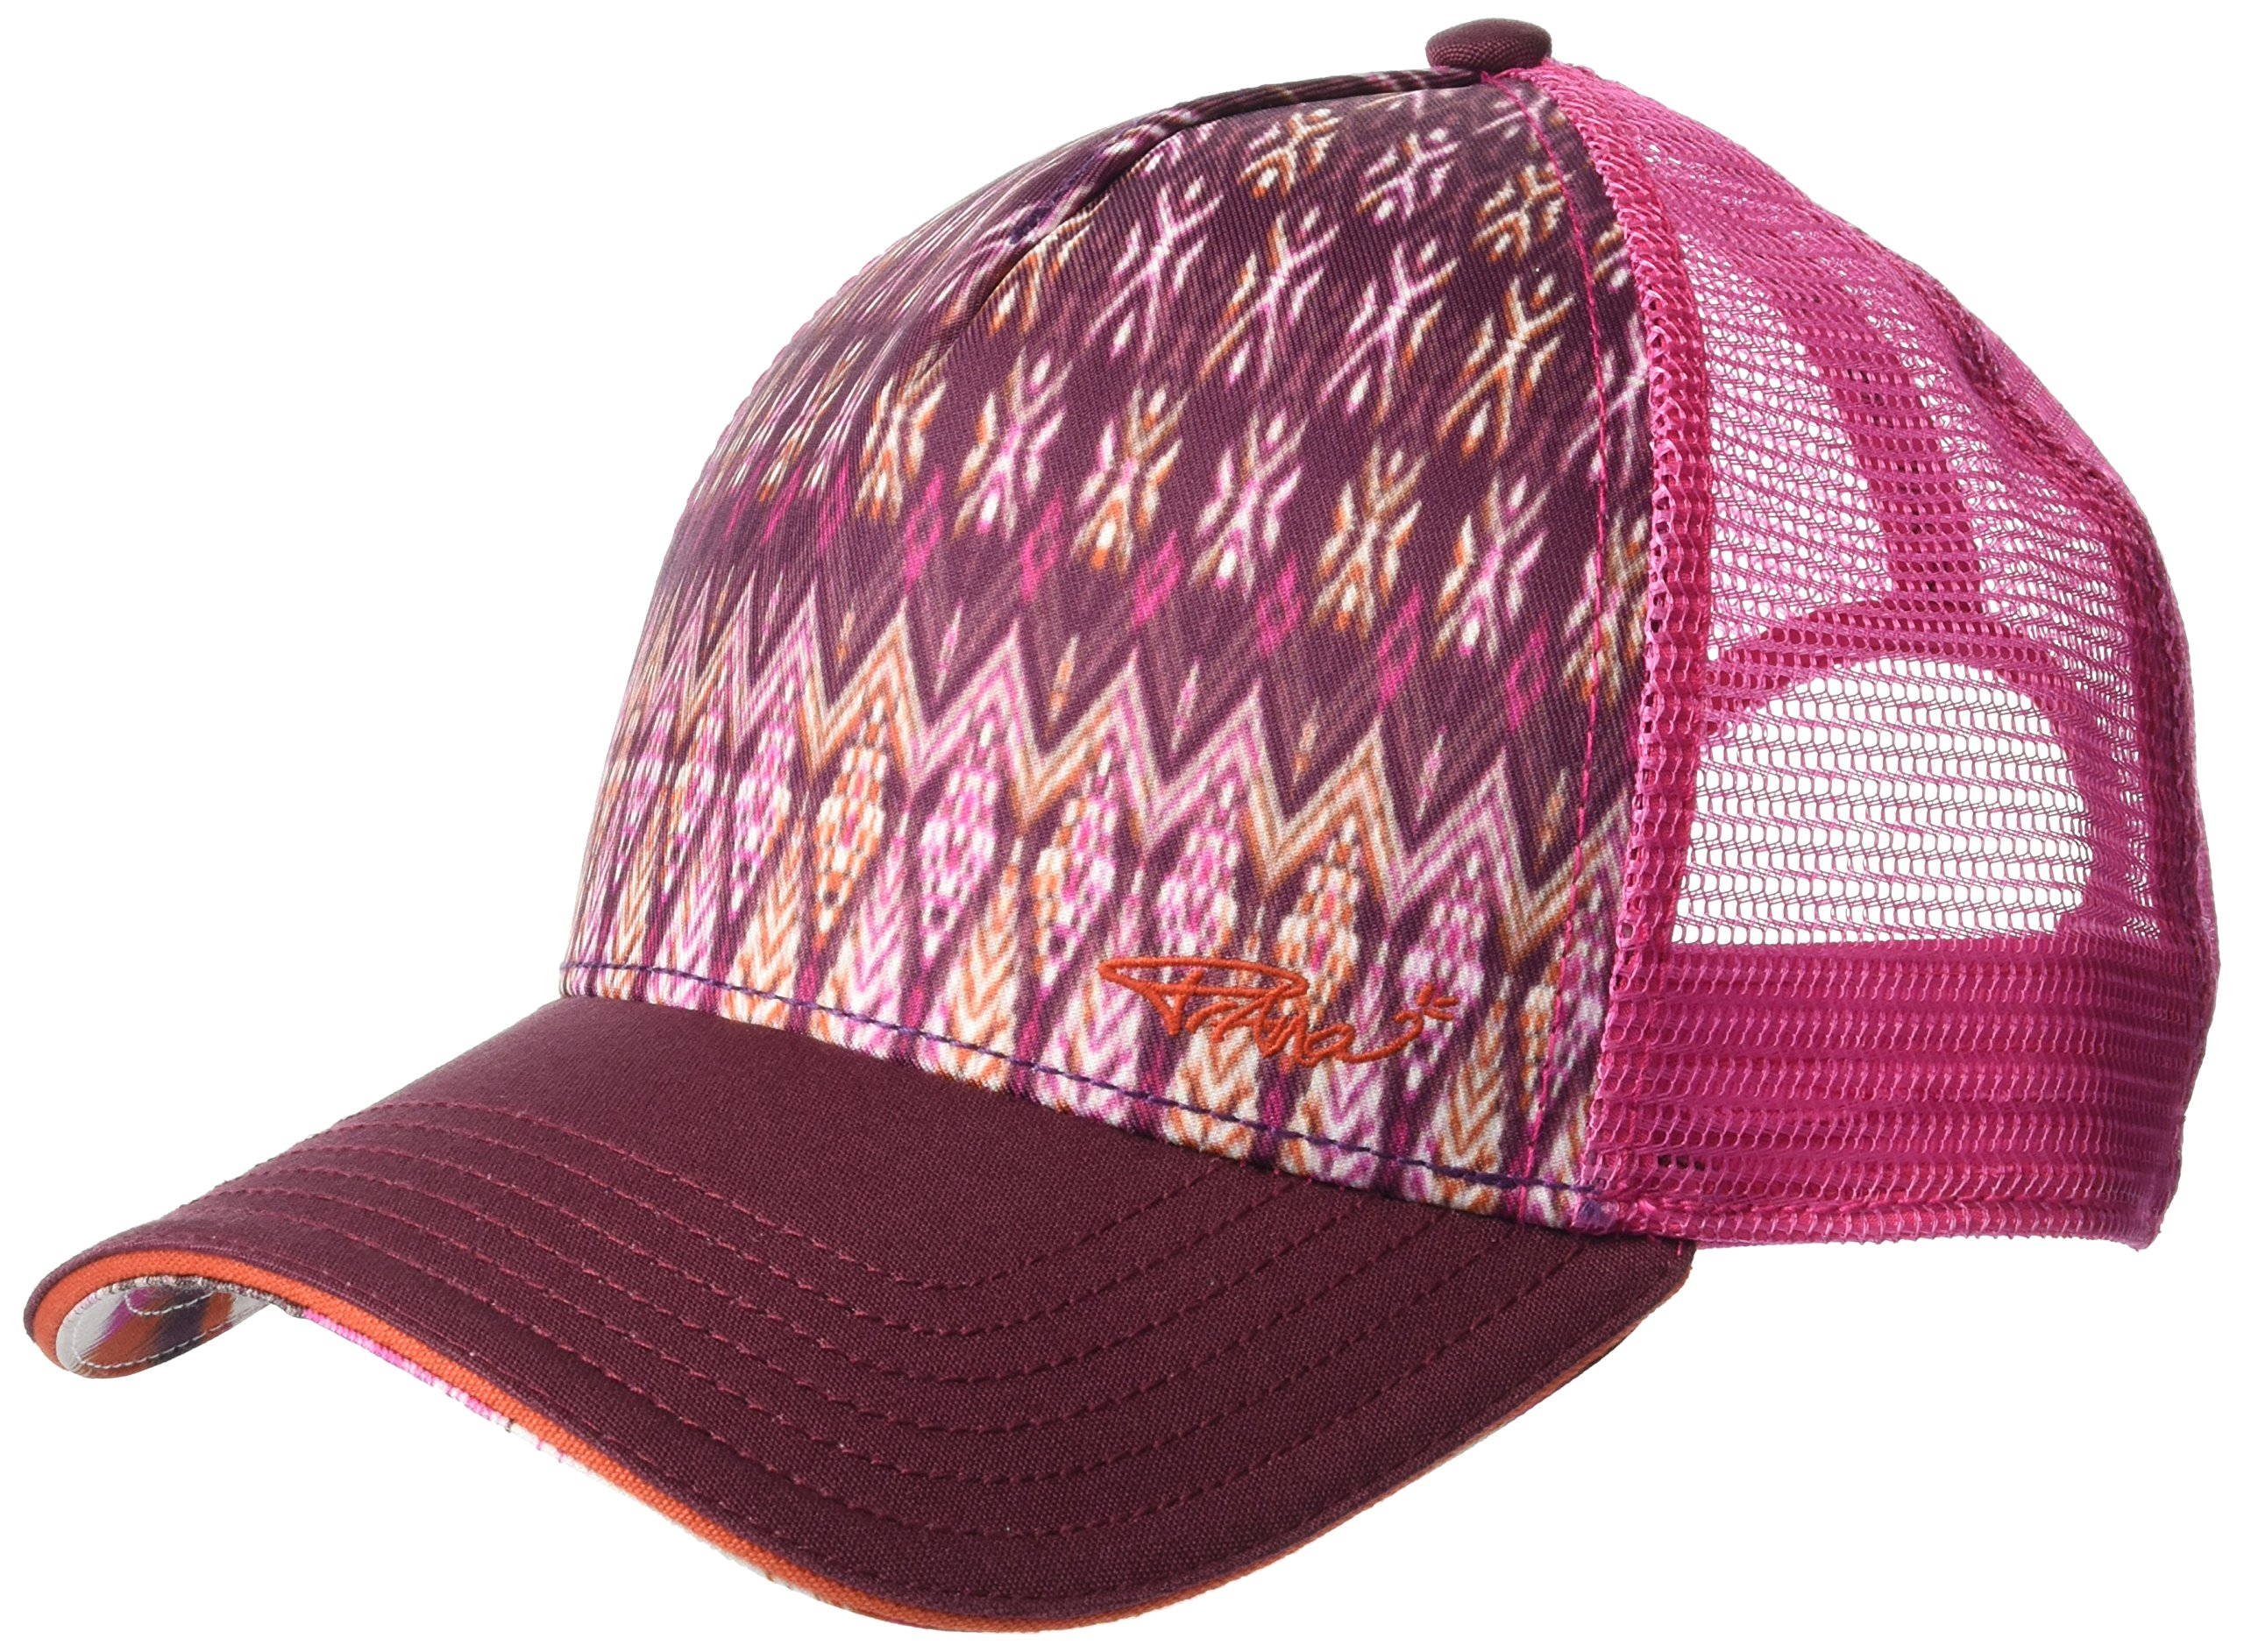 prAna Women's La Viva Trucker Cold Weather Hats, One Size, Black Cherry Izabal